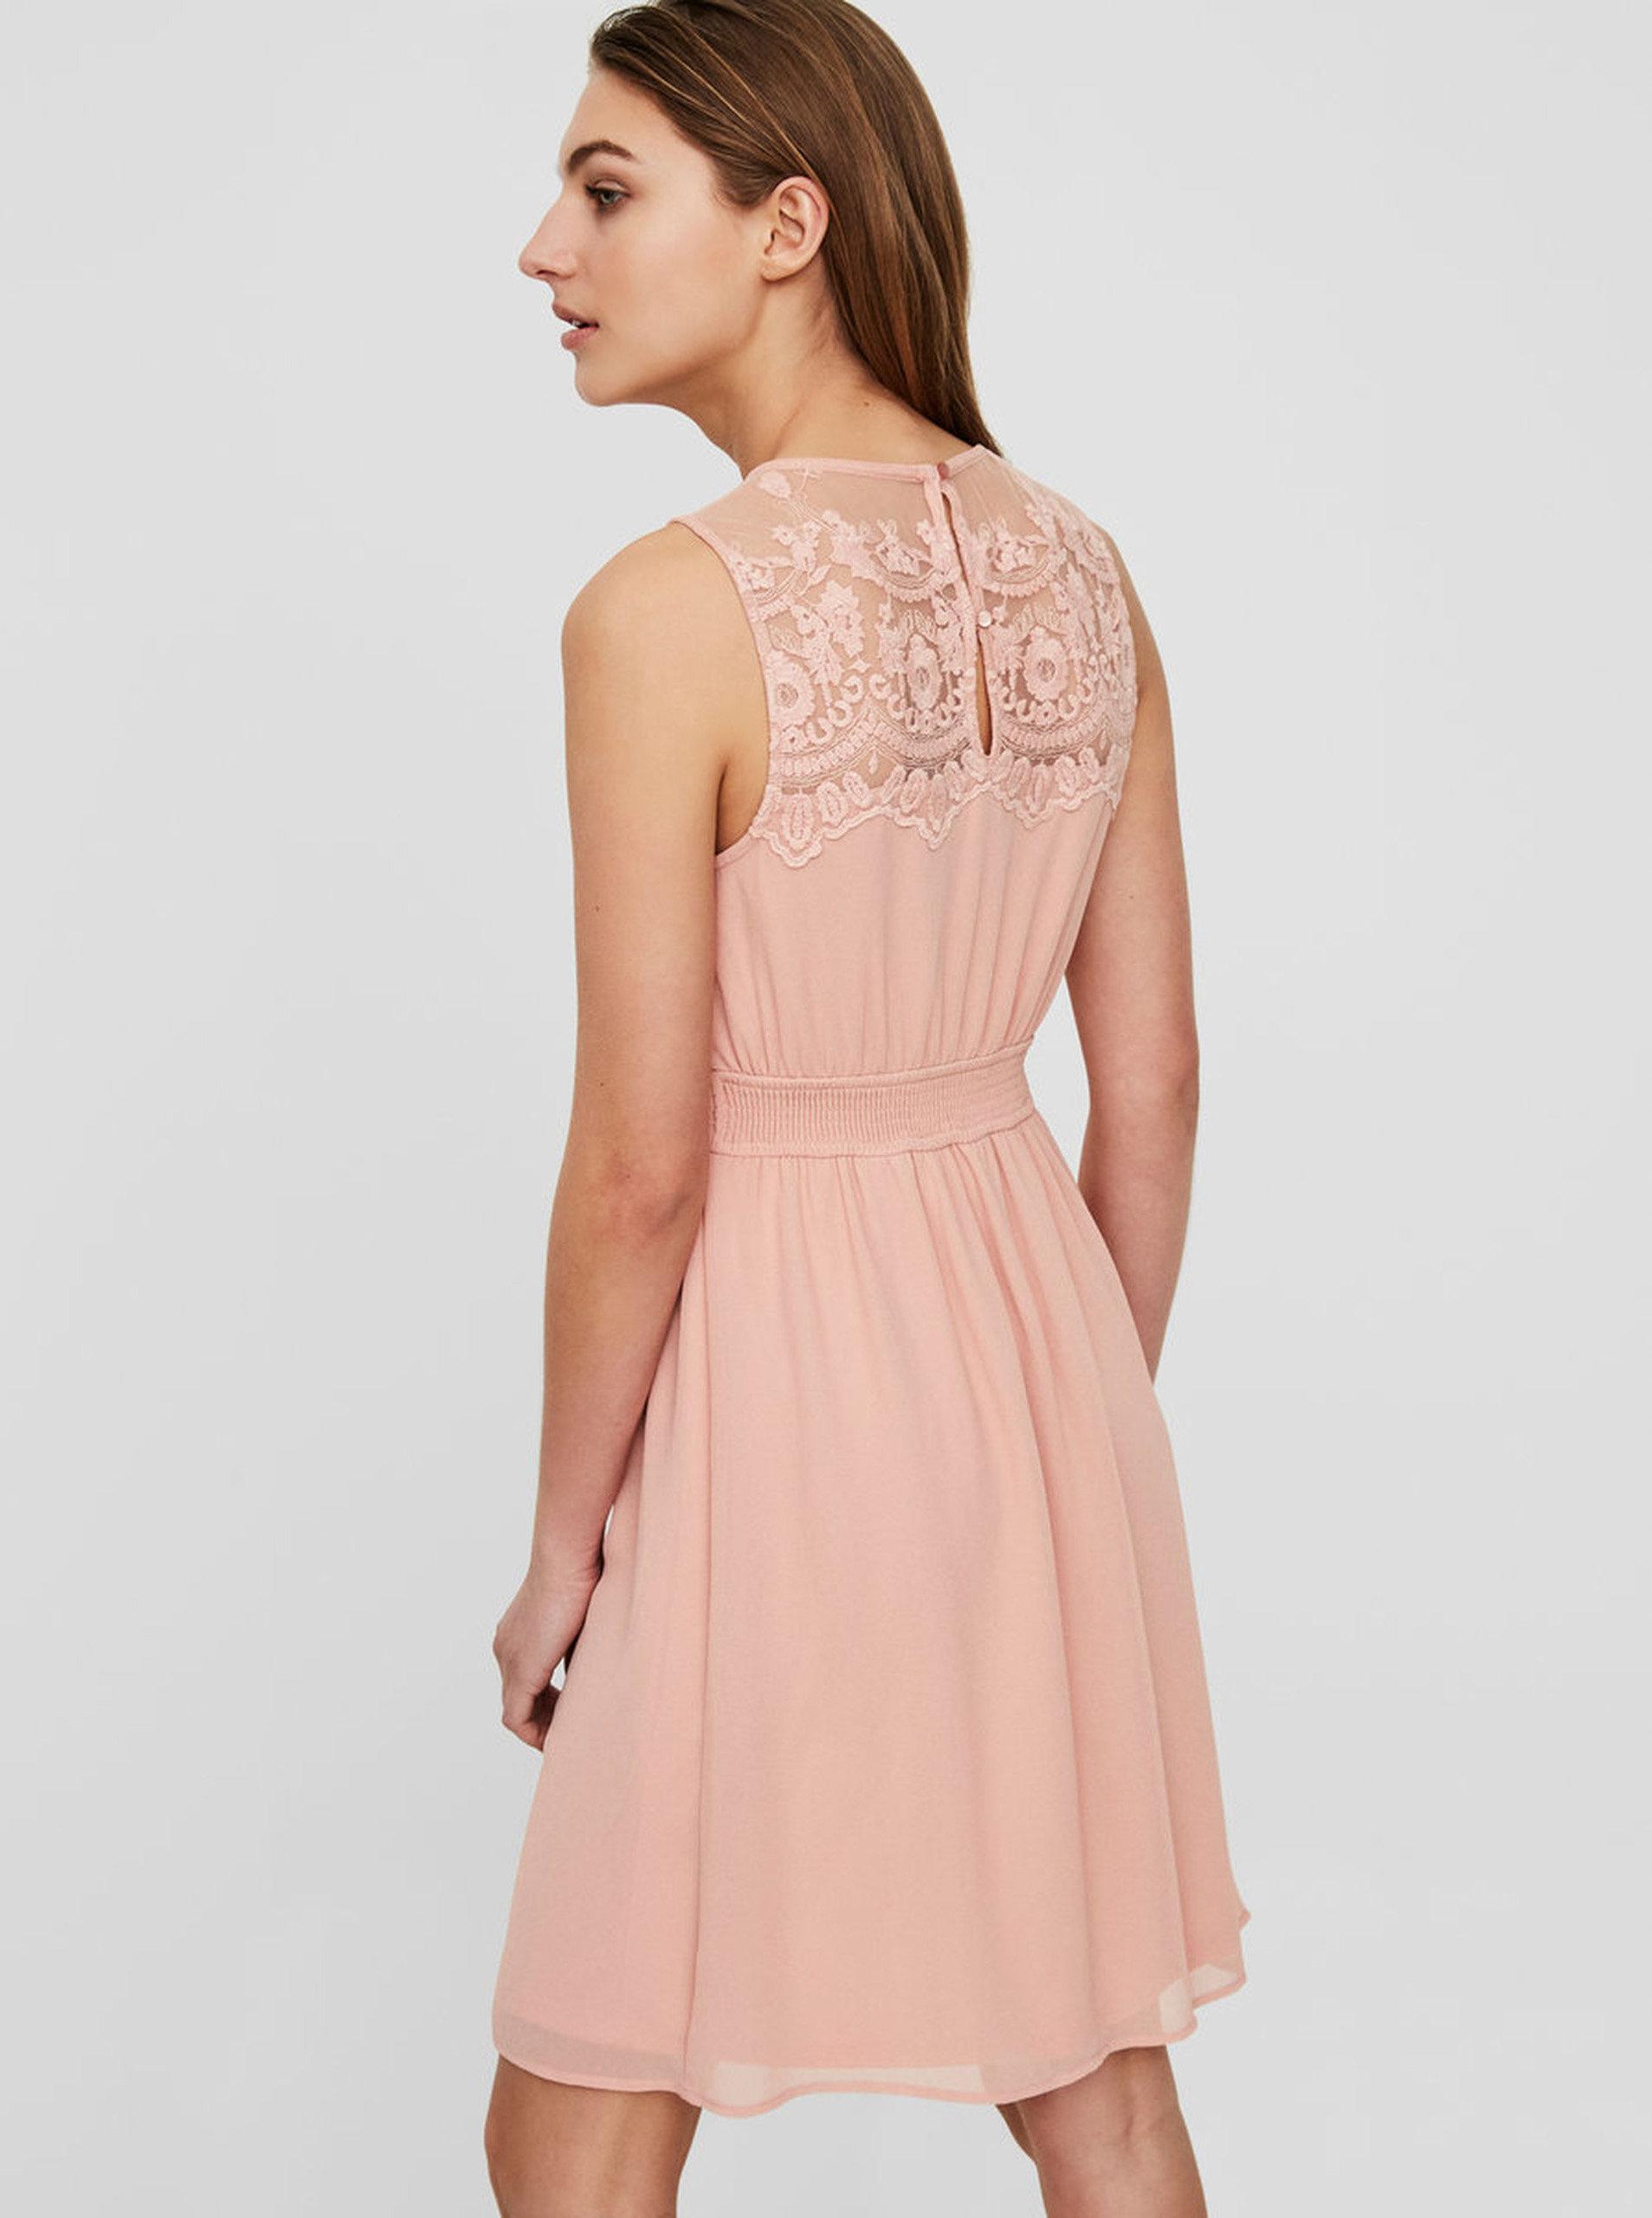 d861c79653b2 Ružové šaty s čipkou VERO MODA Vanessa ...